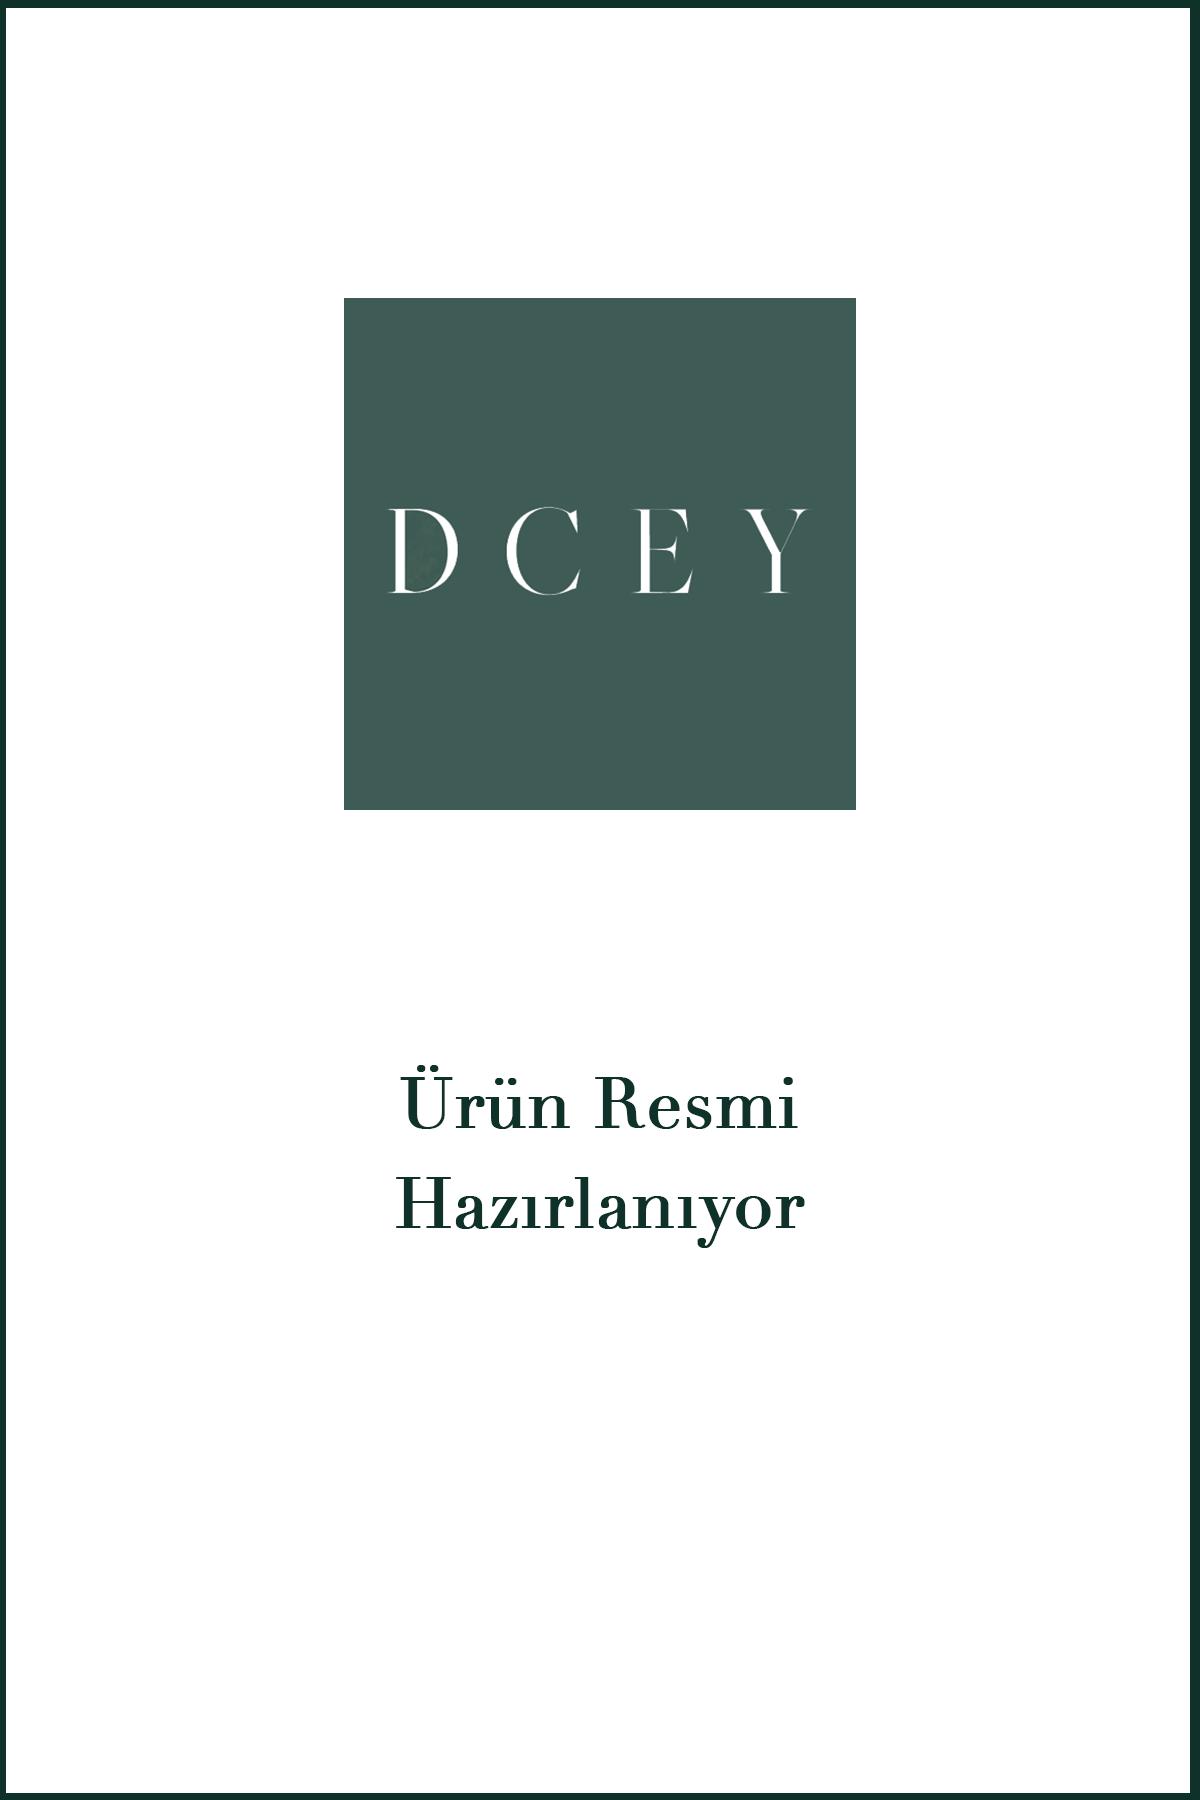 Terekhov Mini Elbise